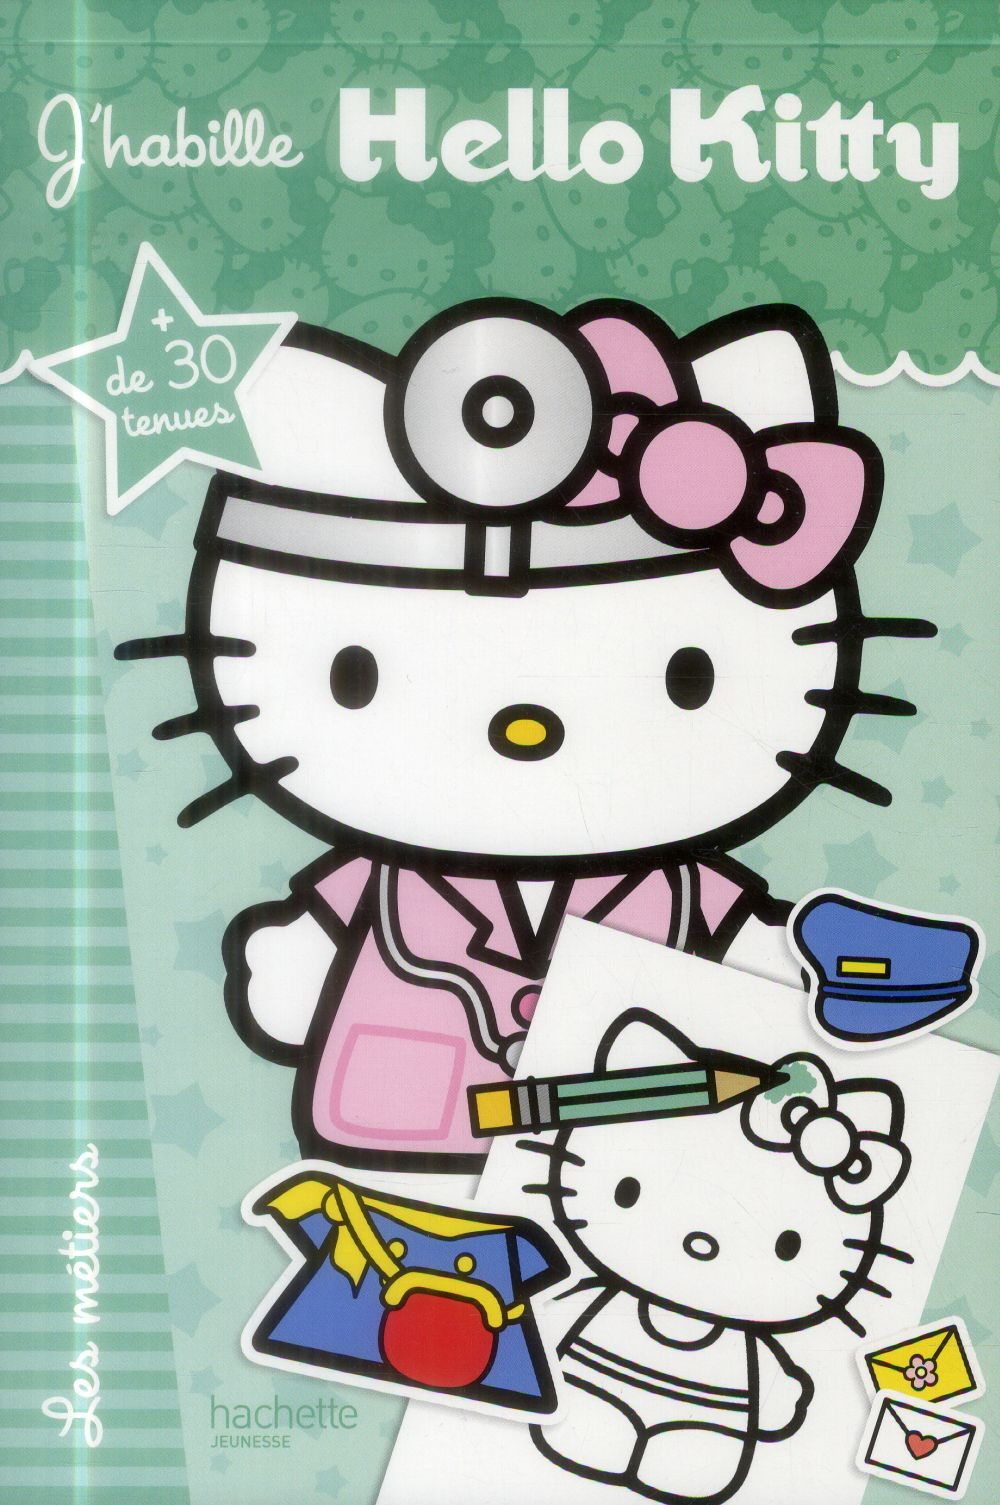 J'habille Hello Kitty ; les métiers